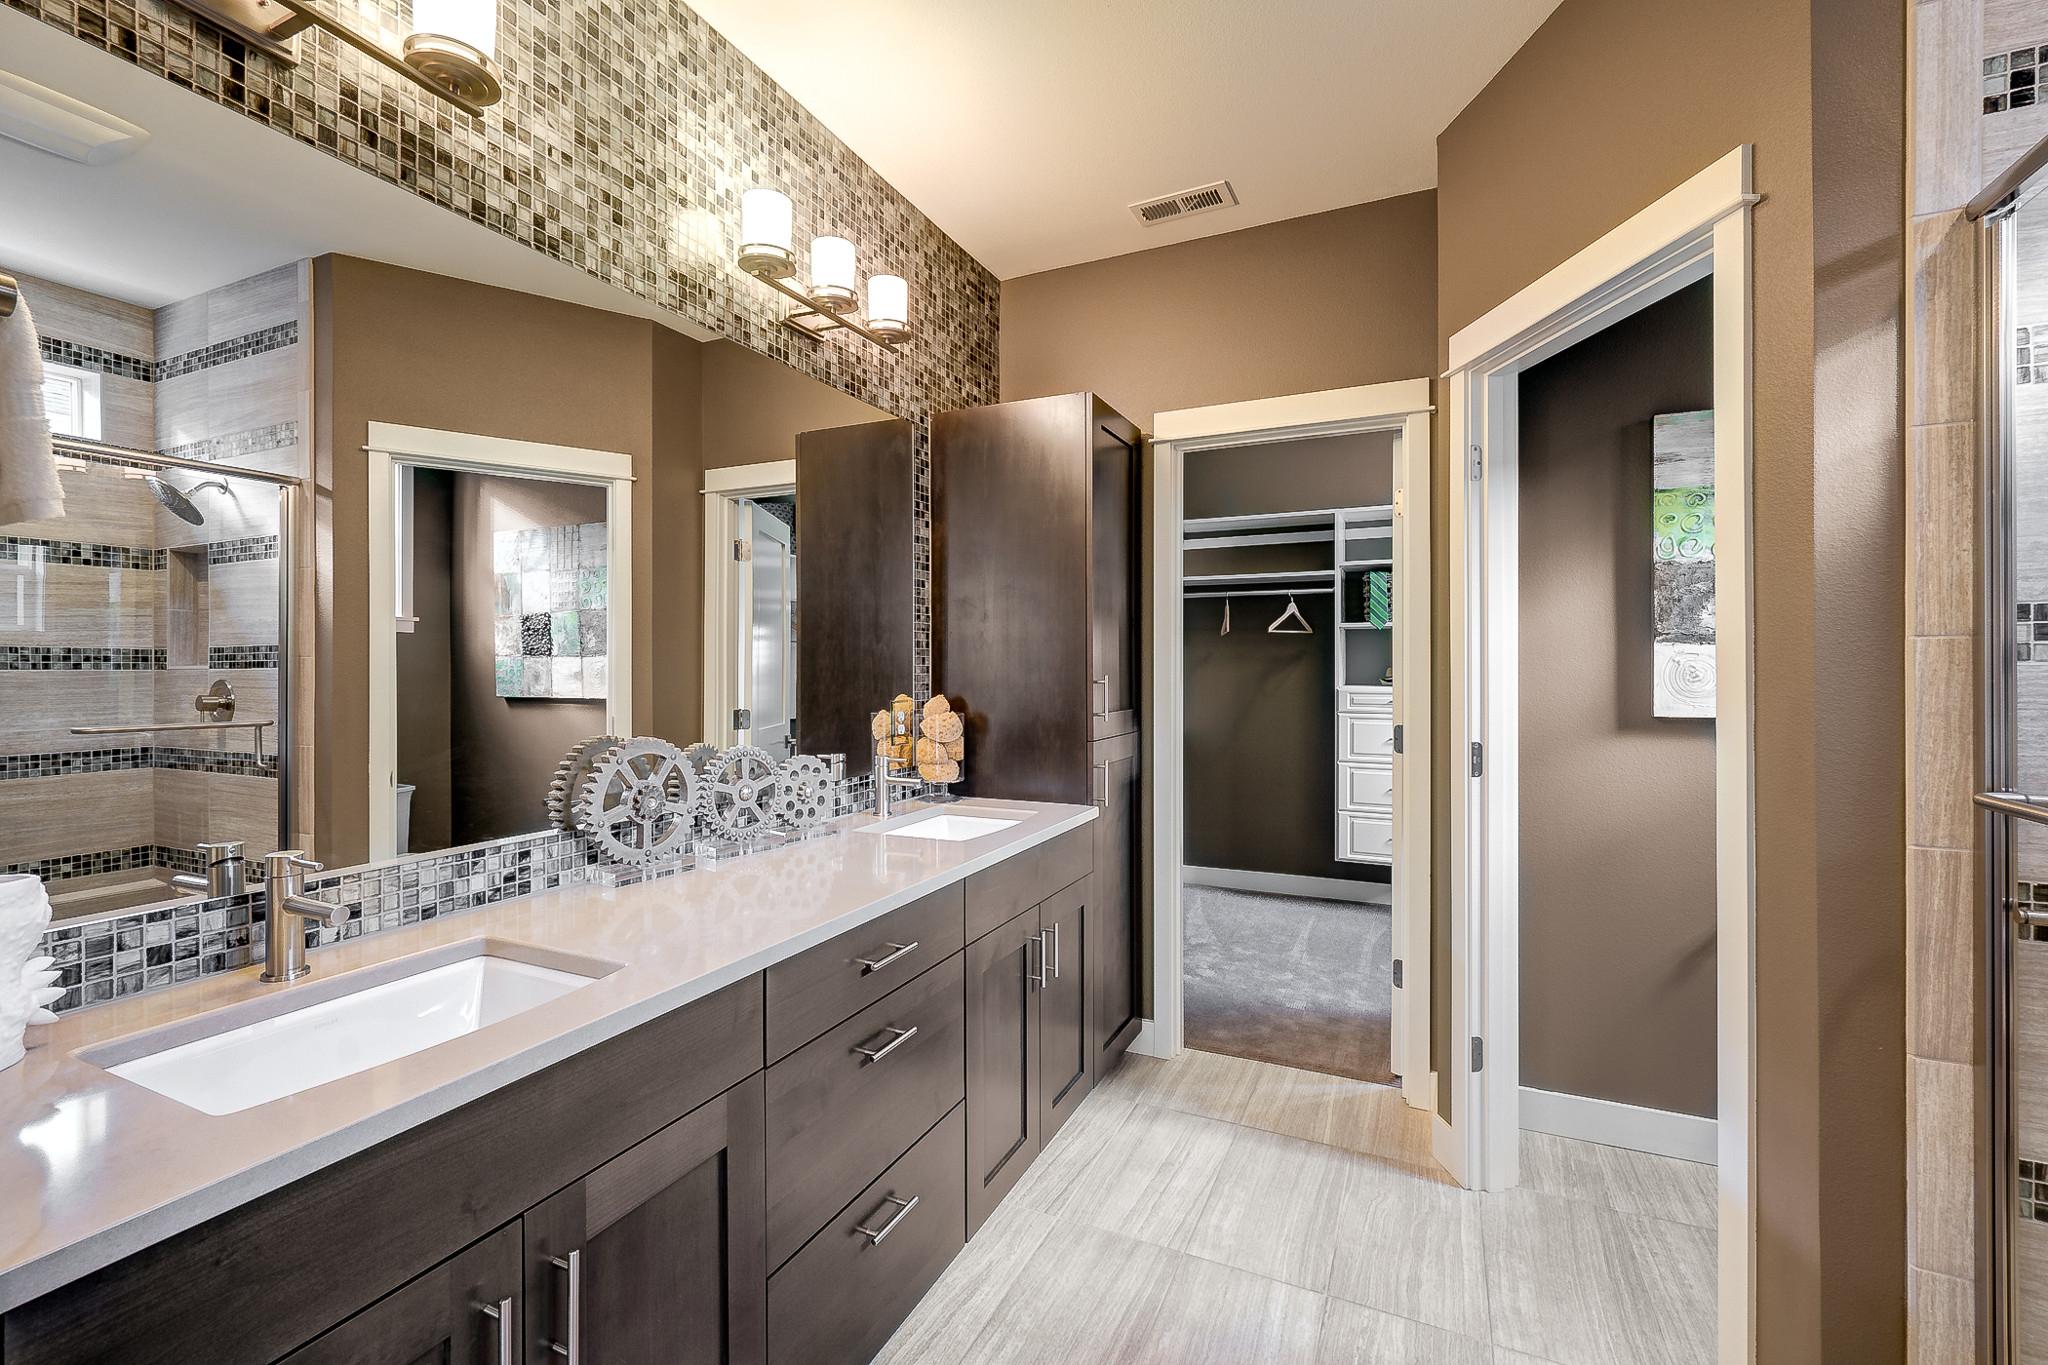 Shea Homes at Jubilee Refresh Master Bathroom